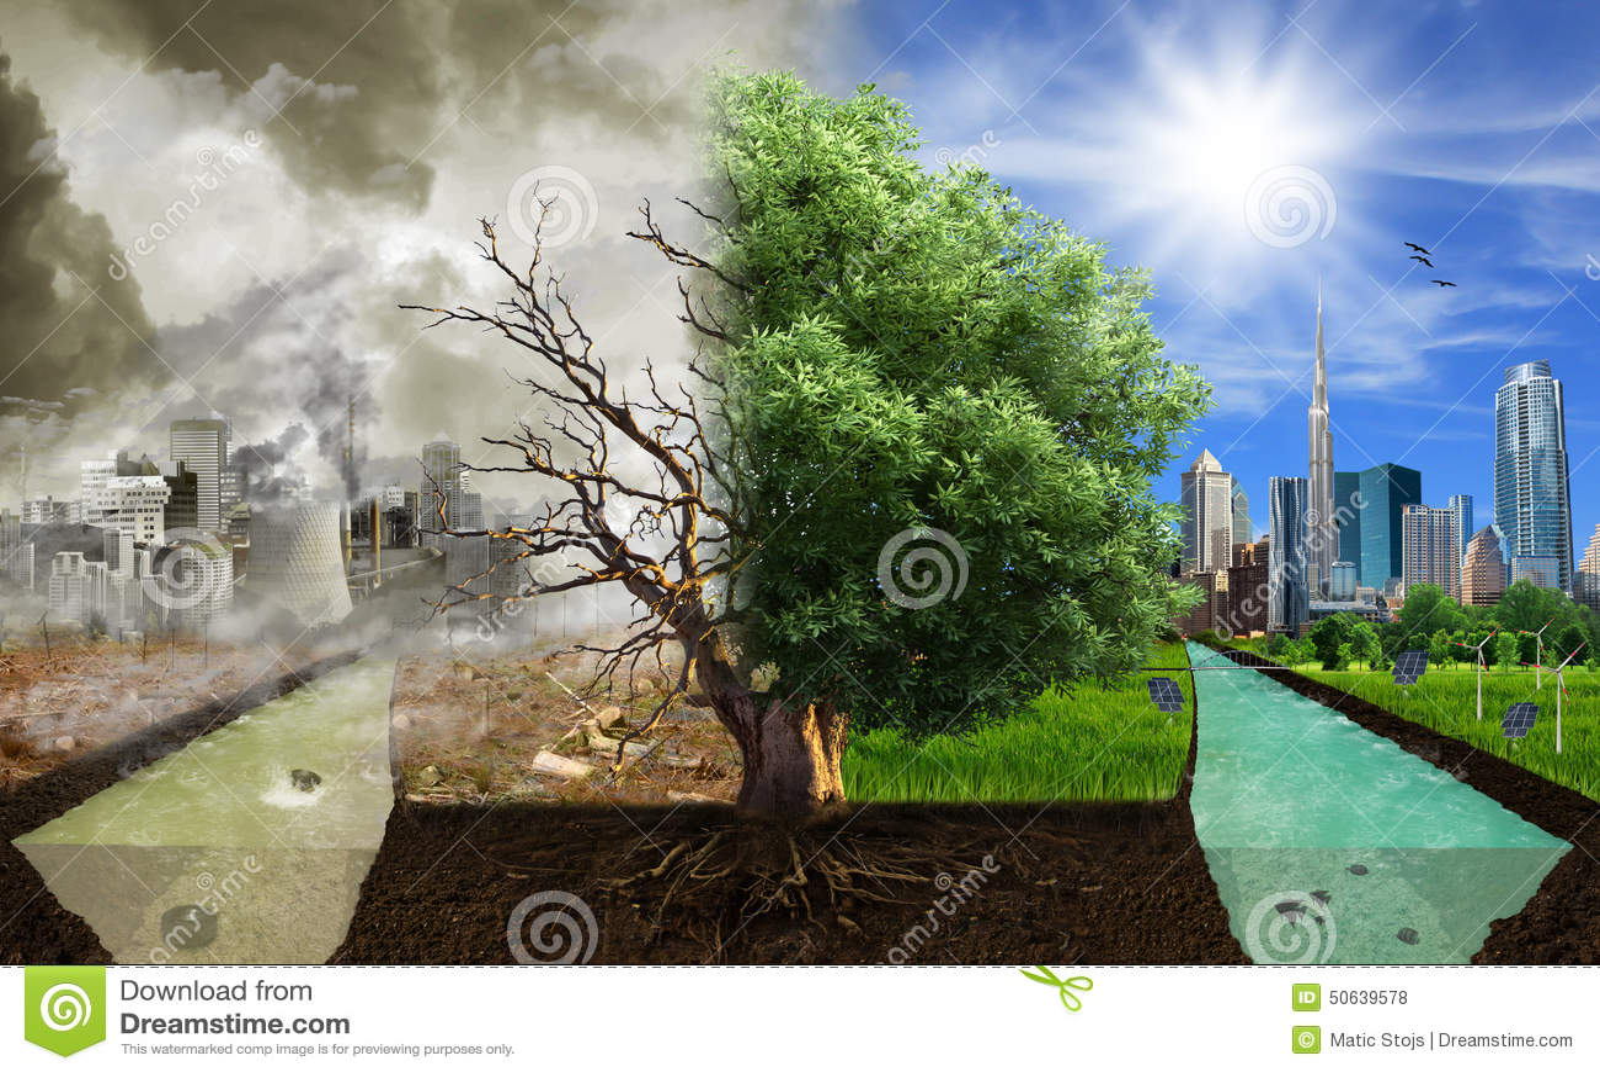 Zwei Wahlen/Seiten, eco Konzept, eco digitale Kunst